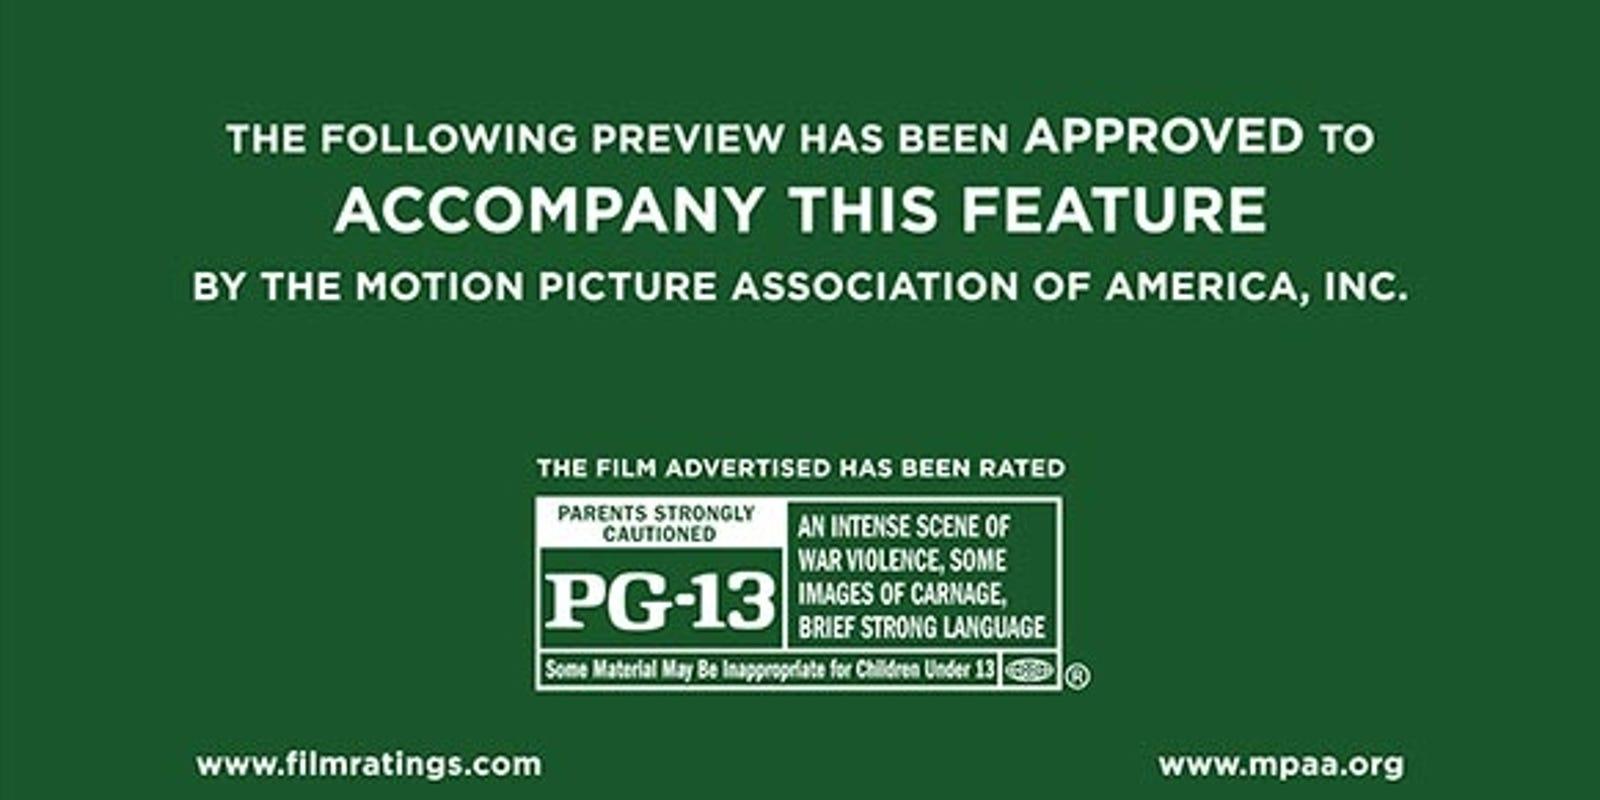 Film Rating Descriptors To Add Detail